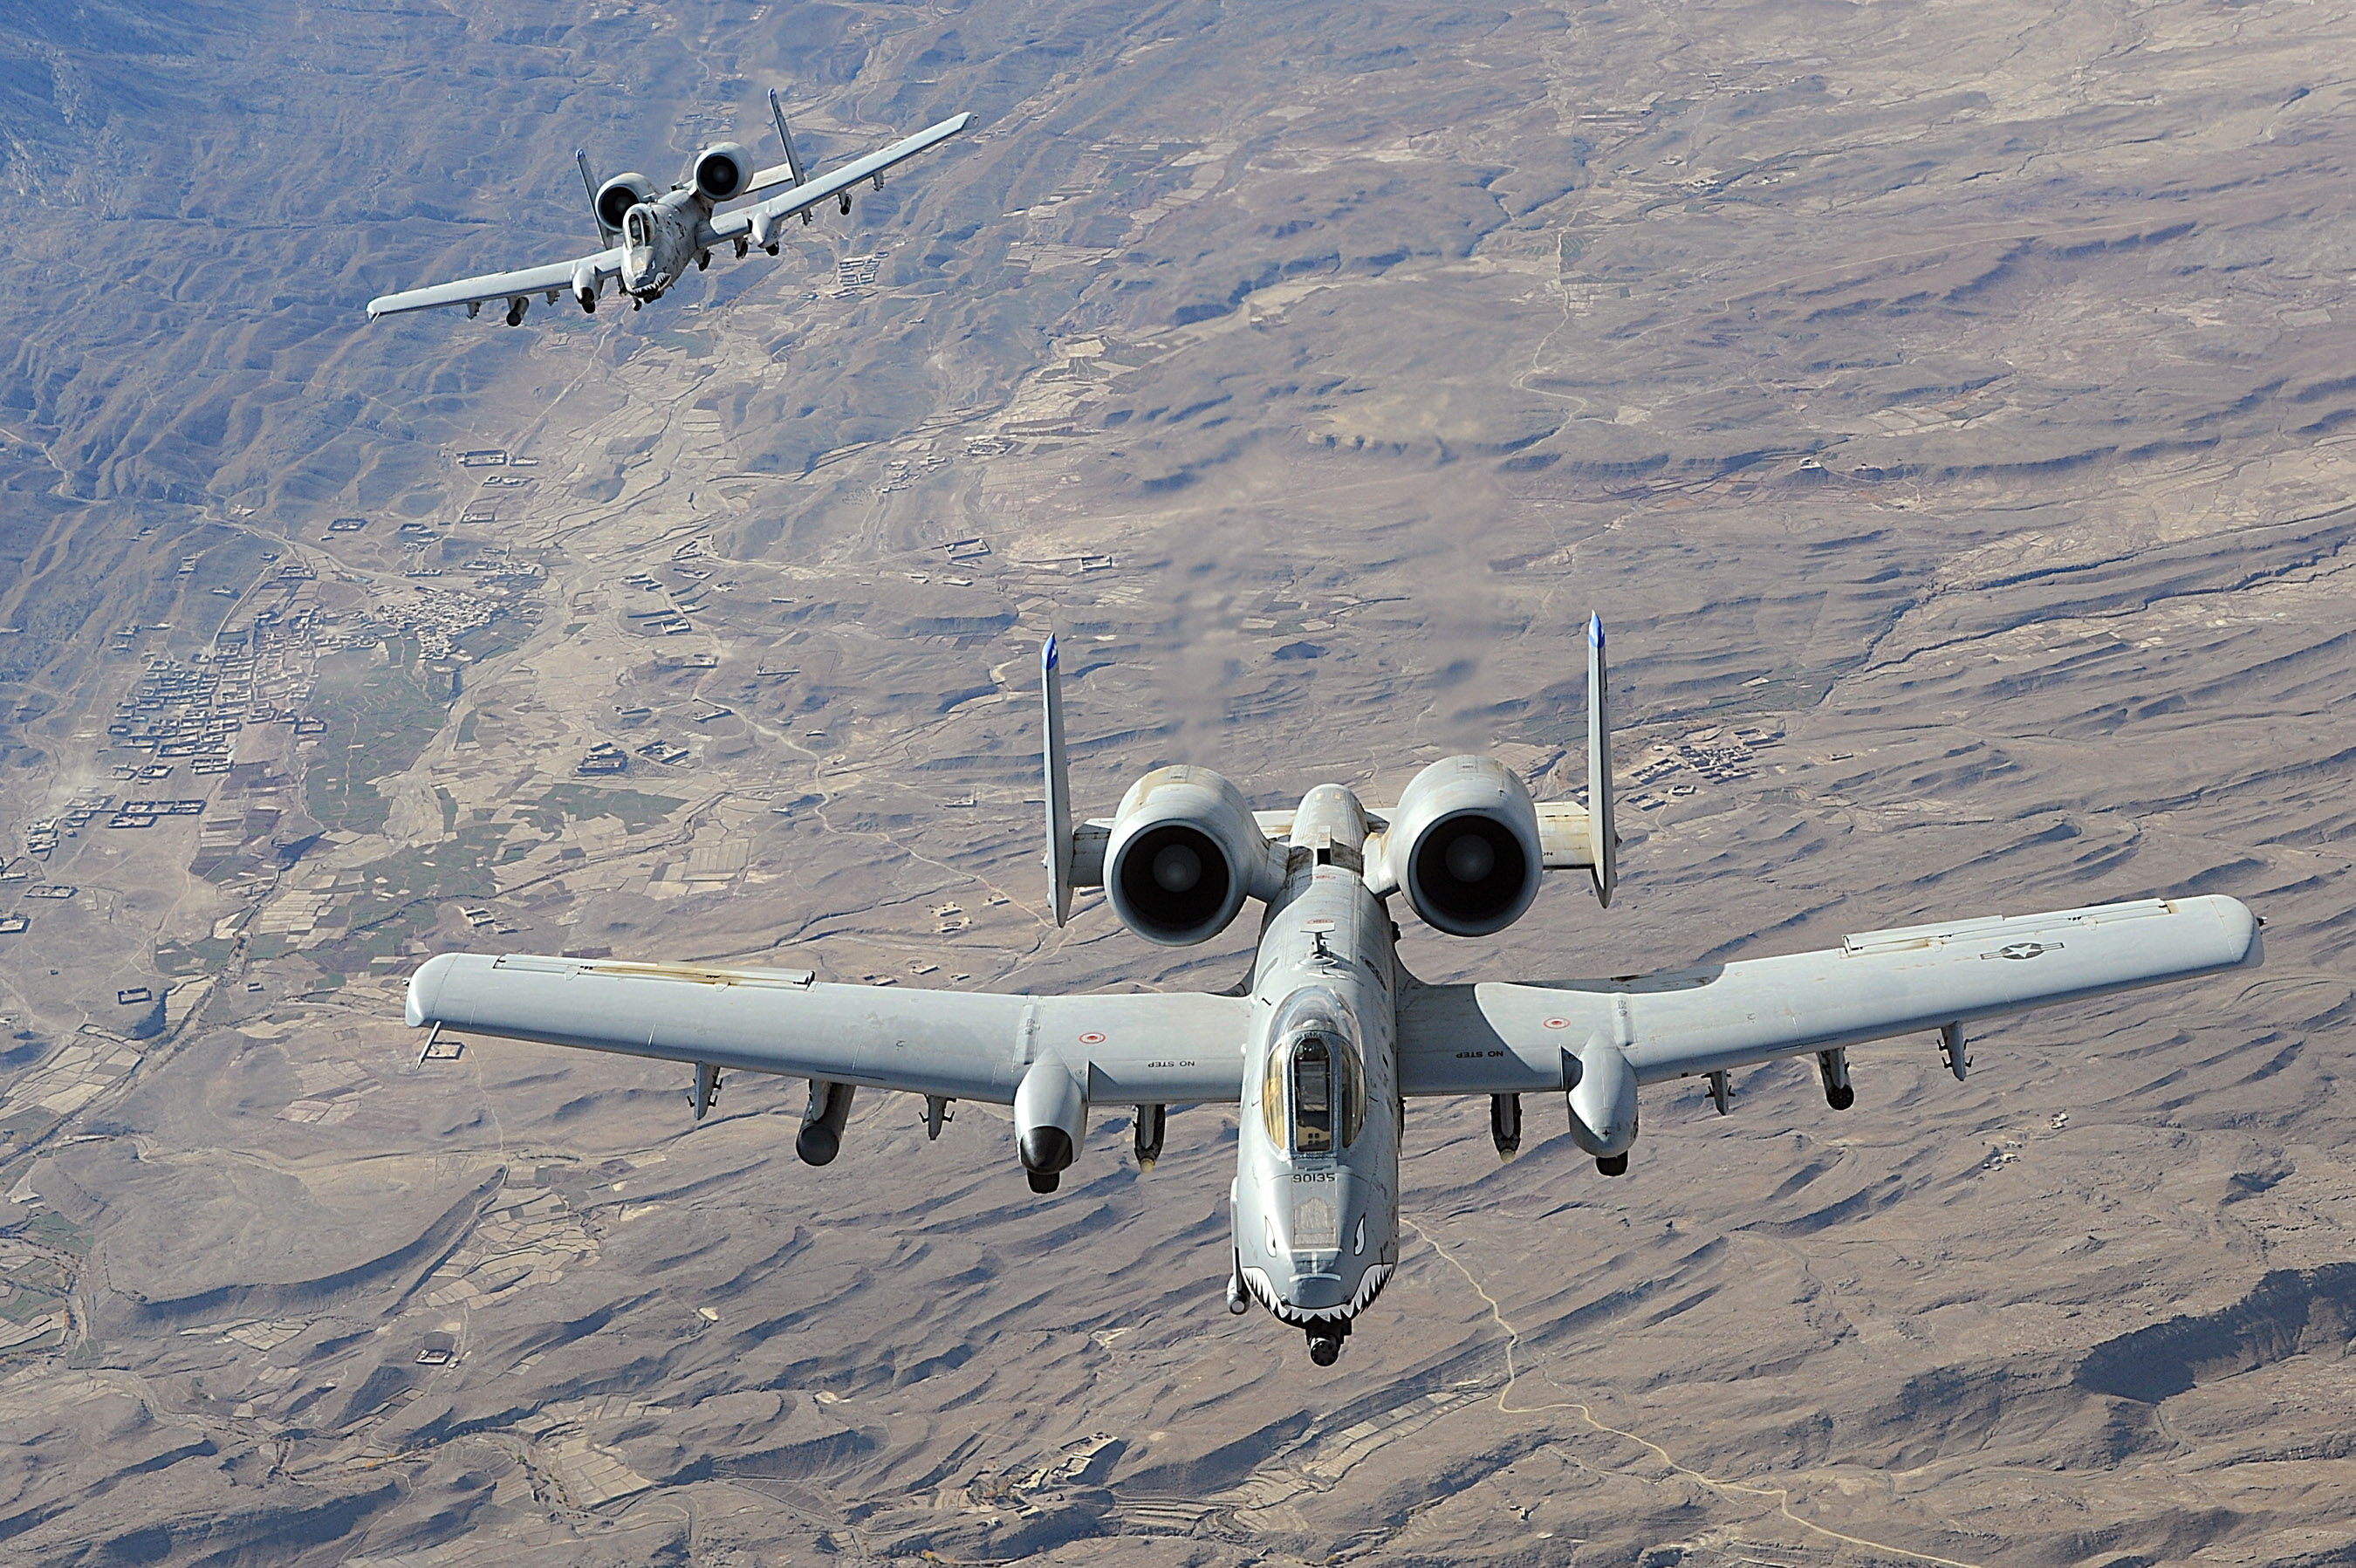 A-10攻击机,外形丑陋火力强大,被称作疣猪